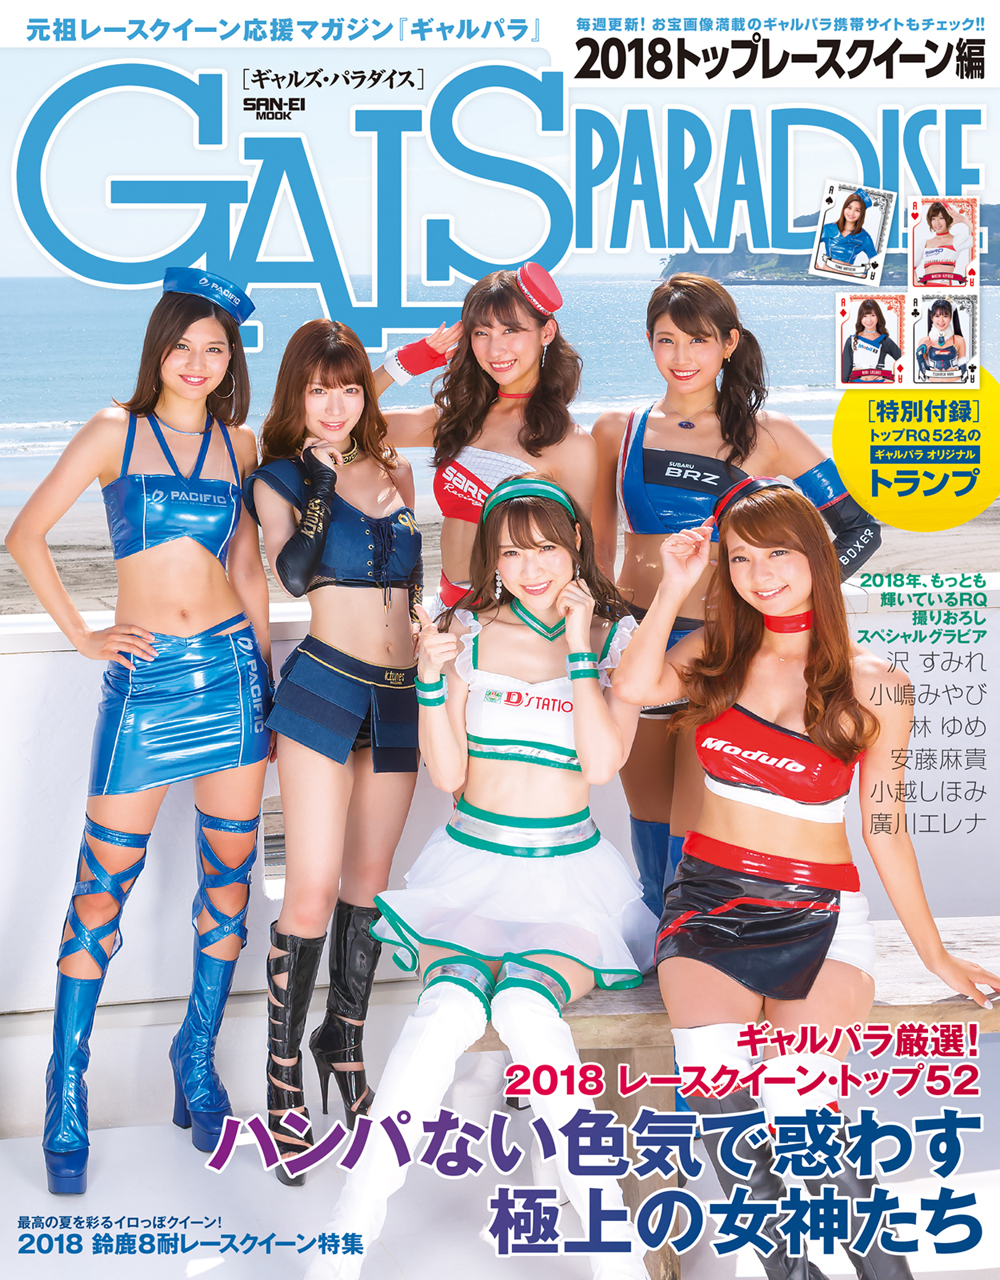 GALS PARADICE | GALS PARADISE 2018 トップレースクイーン編